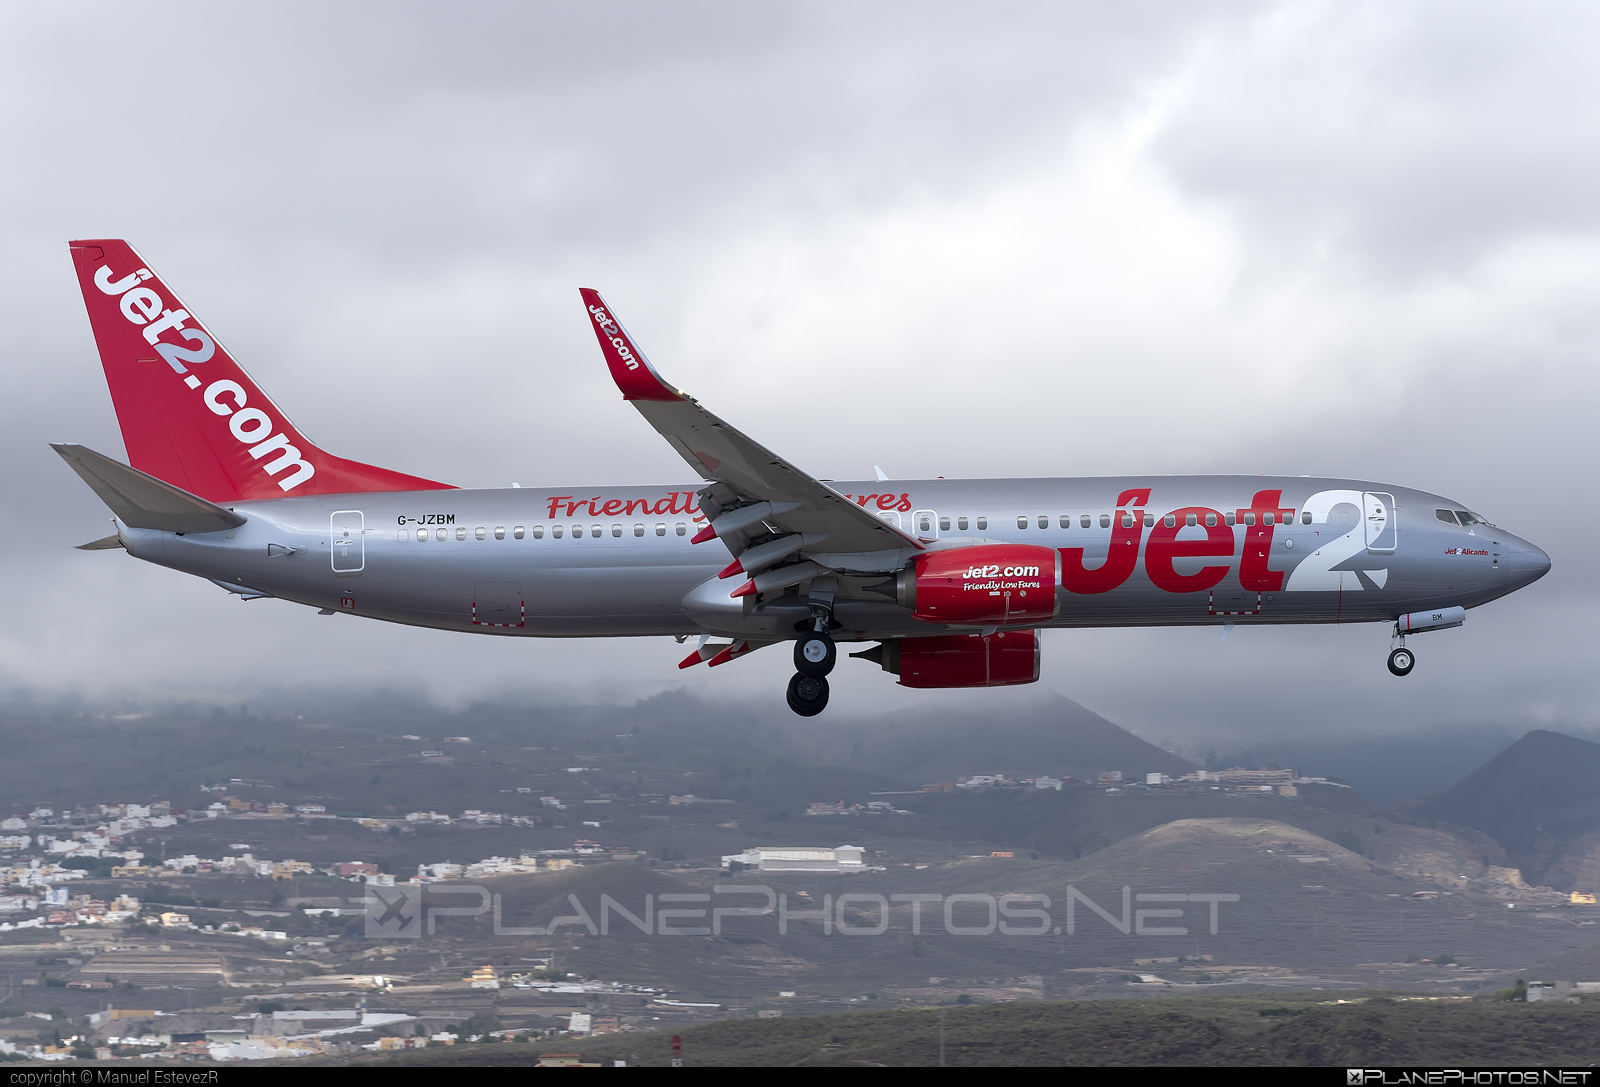 Boeing 737-800 - G-JZBM operated by Jet2 #b737 #b737nextgen #b737ng #boeing #boeing737 #jet2